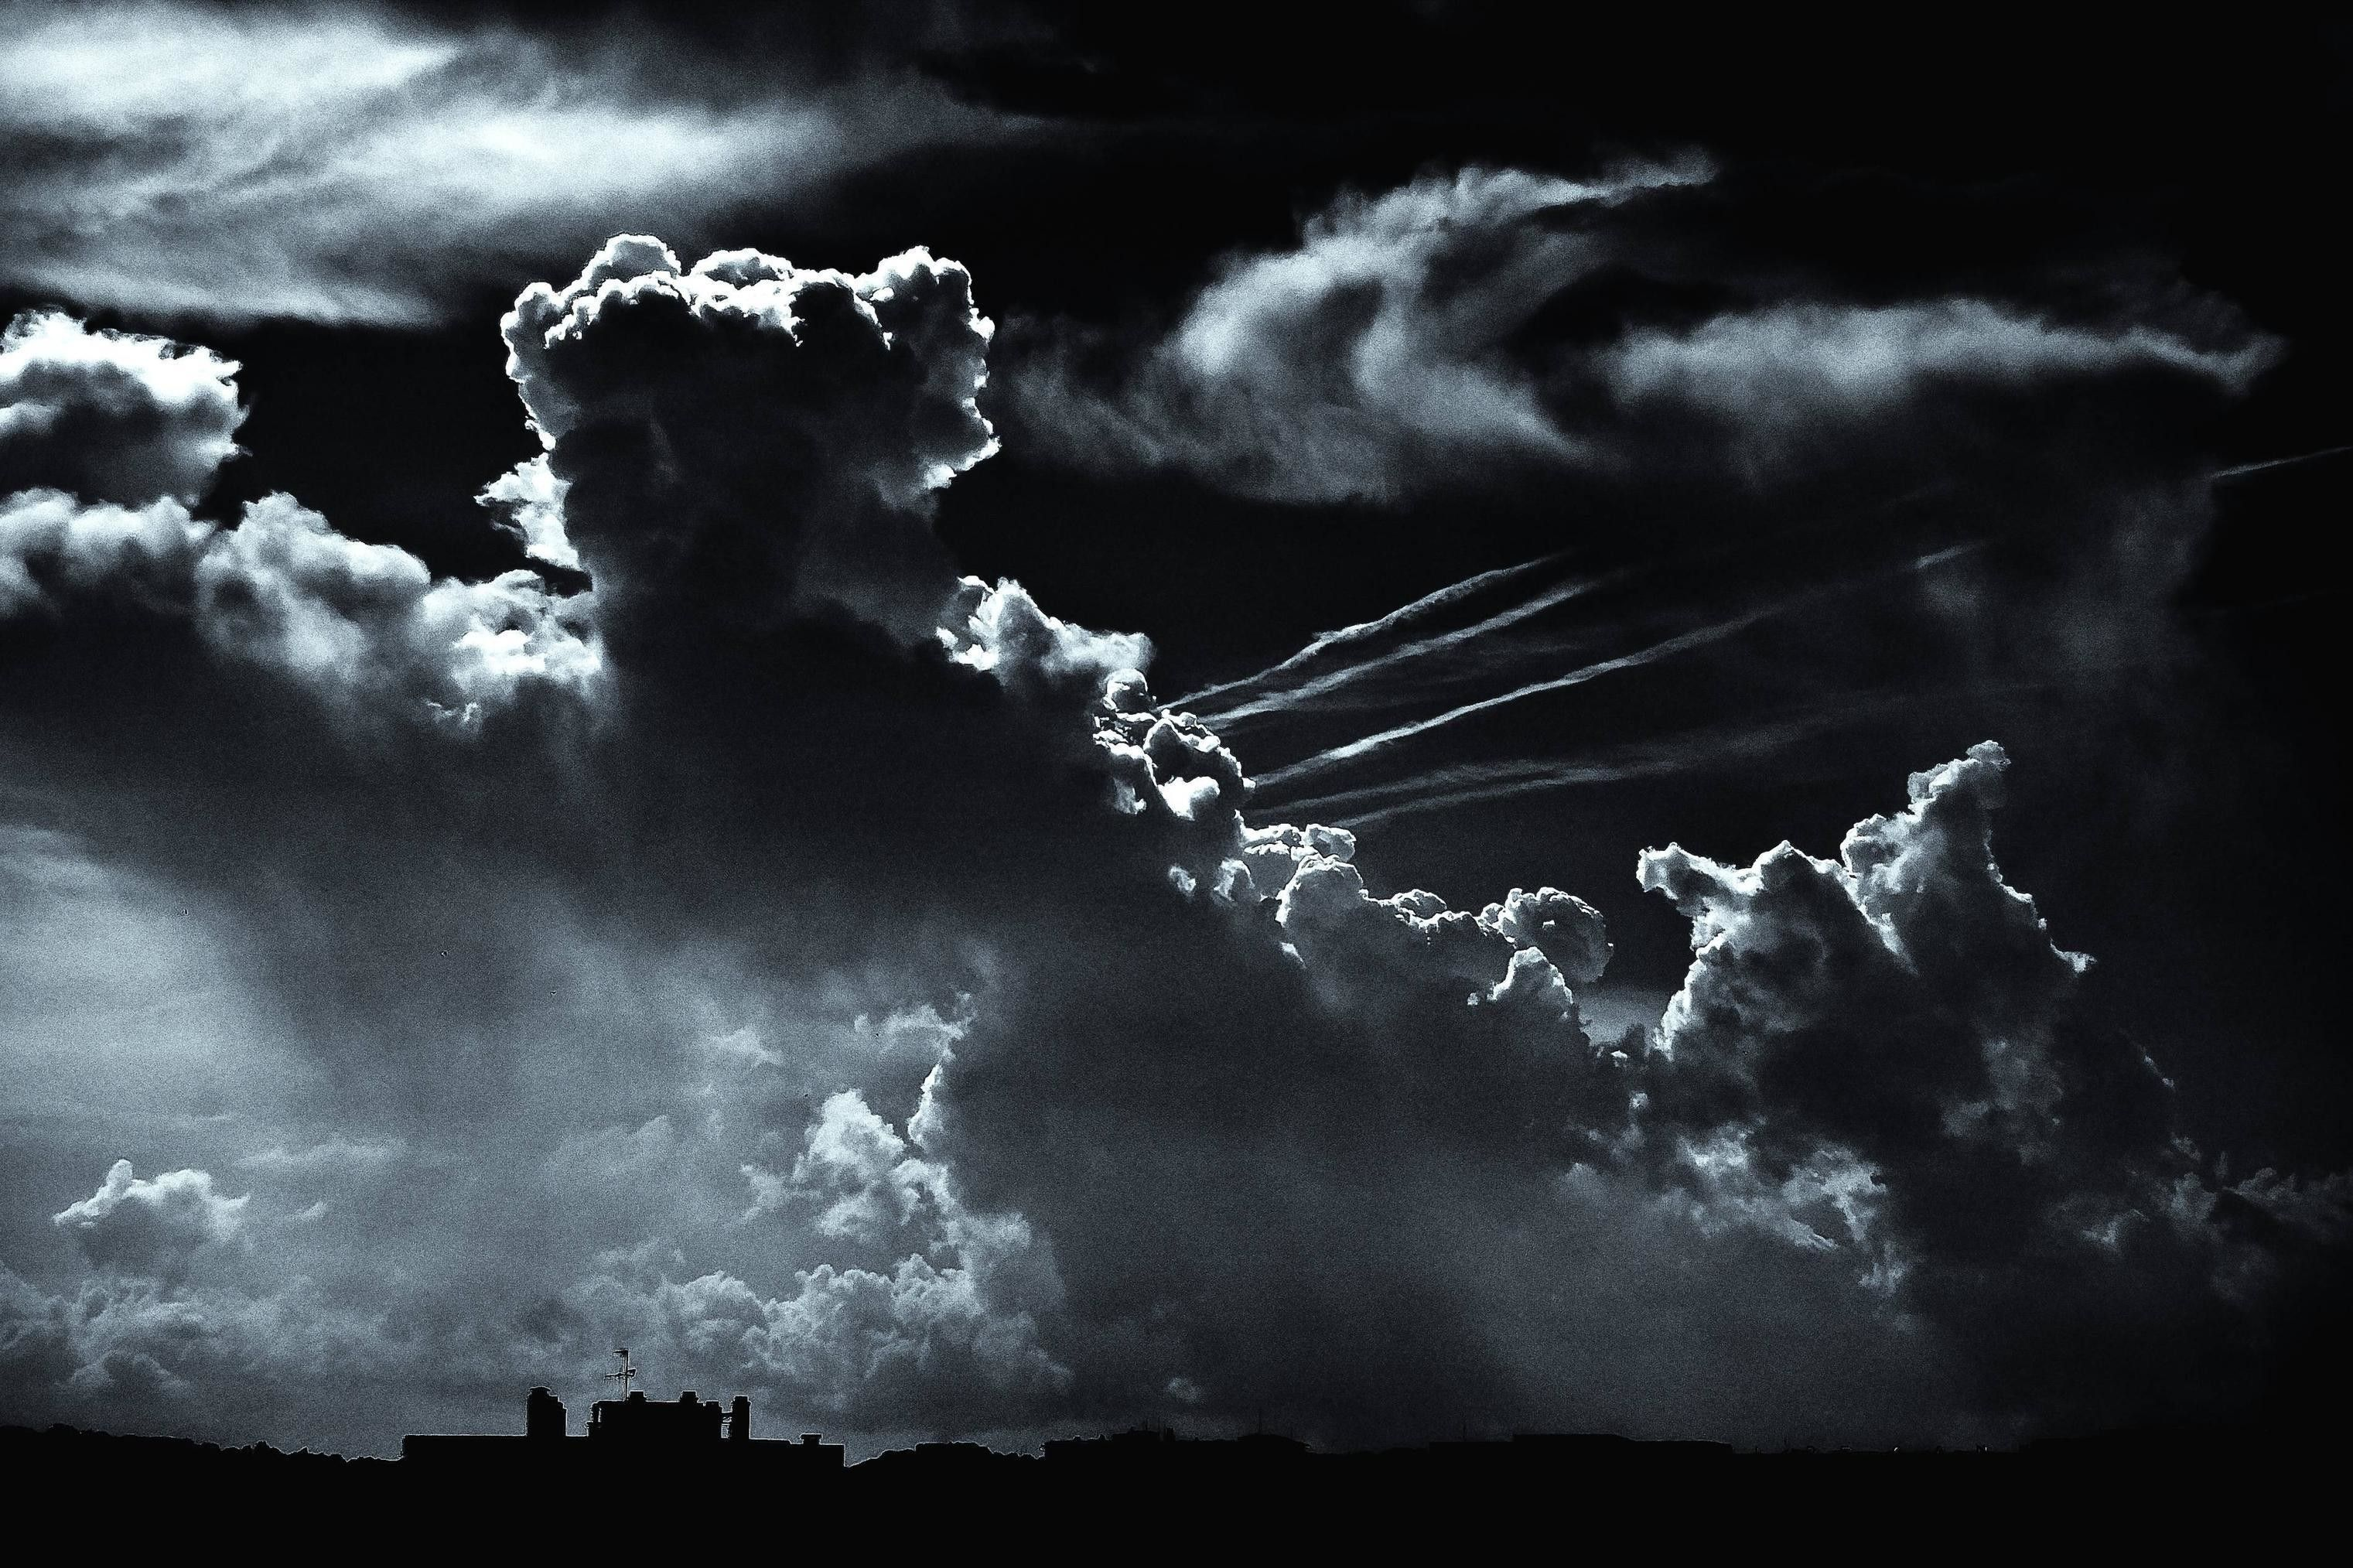 Dark Clouds Wallpapers Top Free Dark Clouds Backgrounds